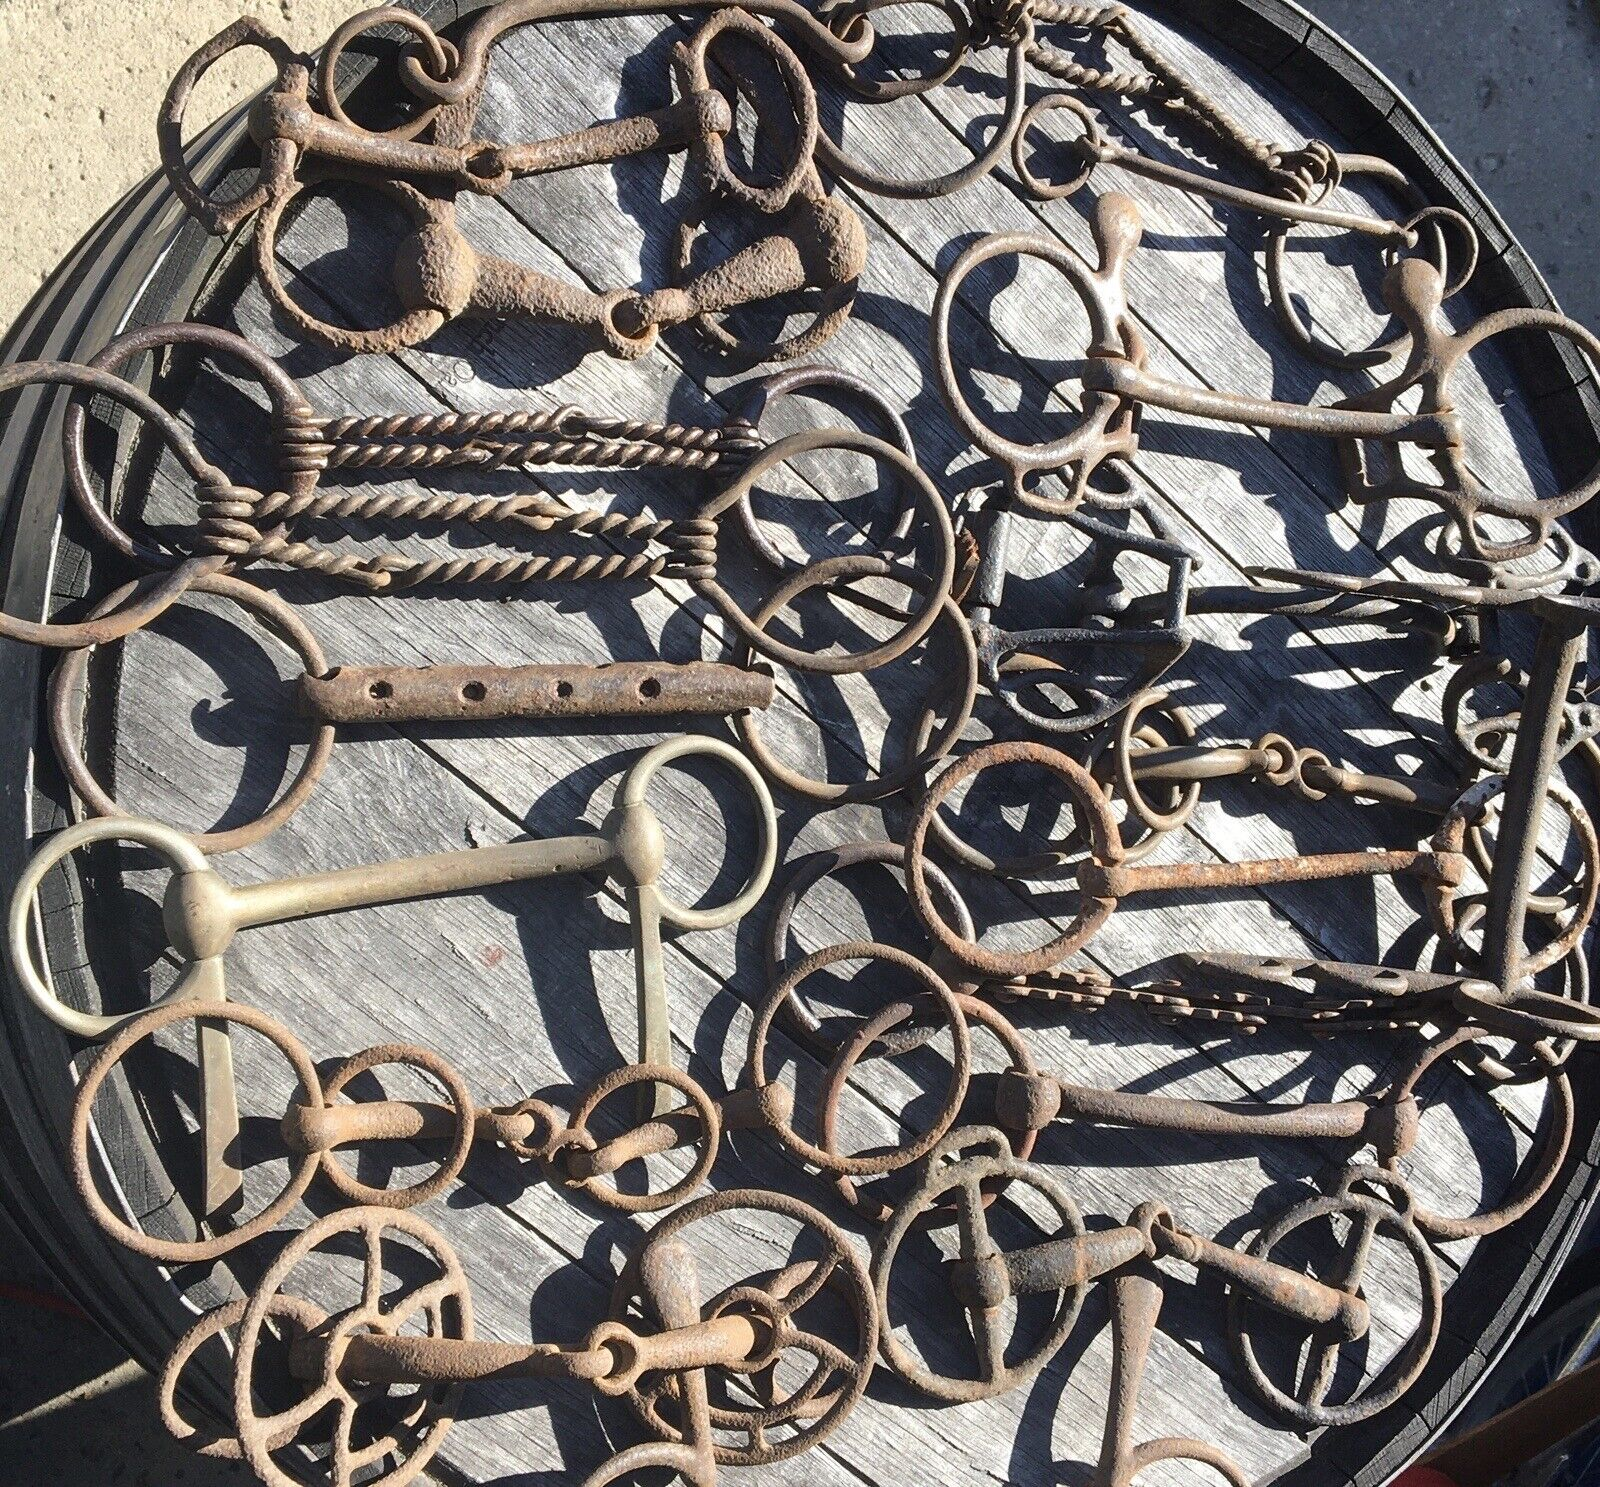 Antique Primative Rusty Metal Horse Bridle Bit Blacksmith Tack Equestrian 014 - $69.99